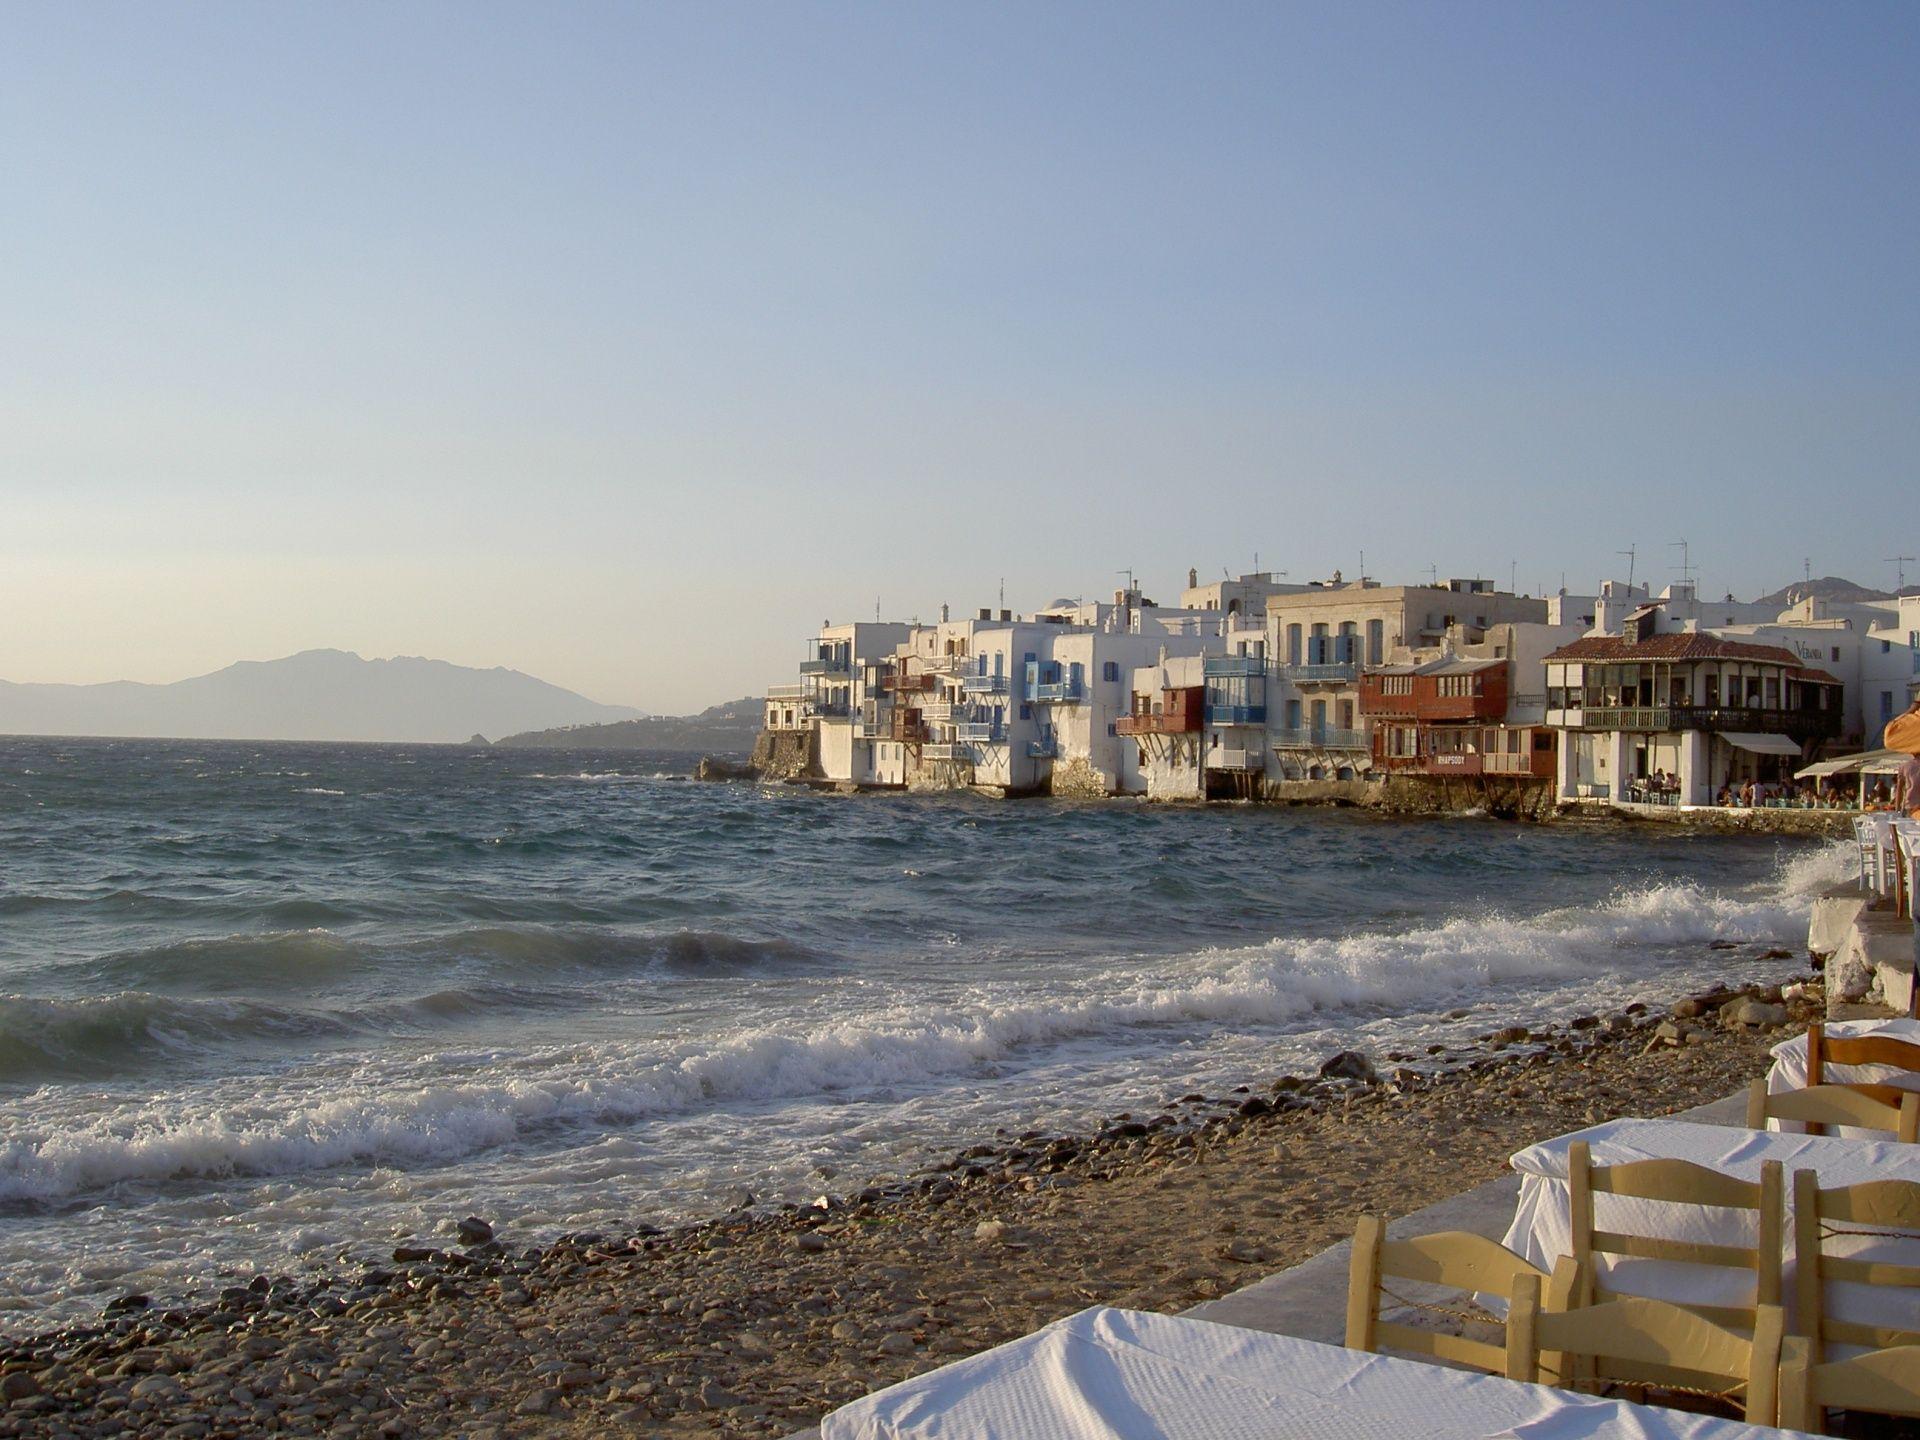 Why choose a cruise through the Greek Islands?